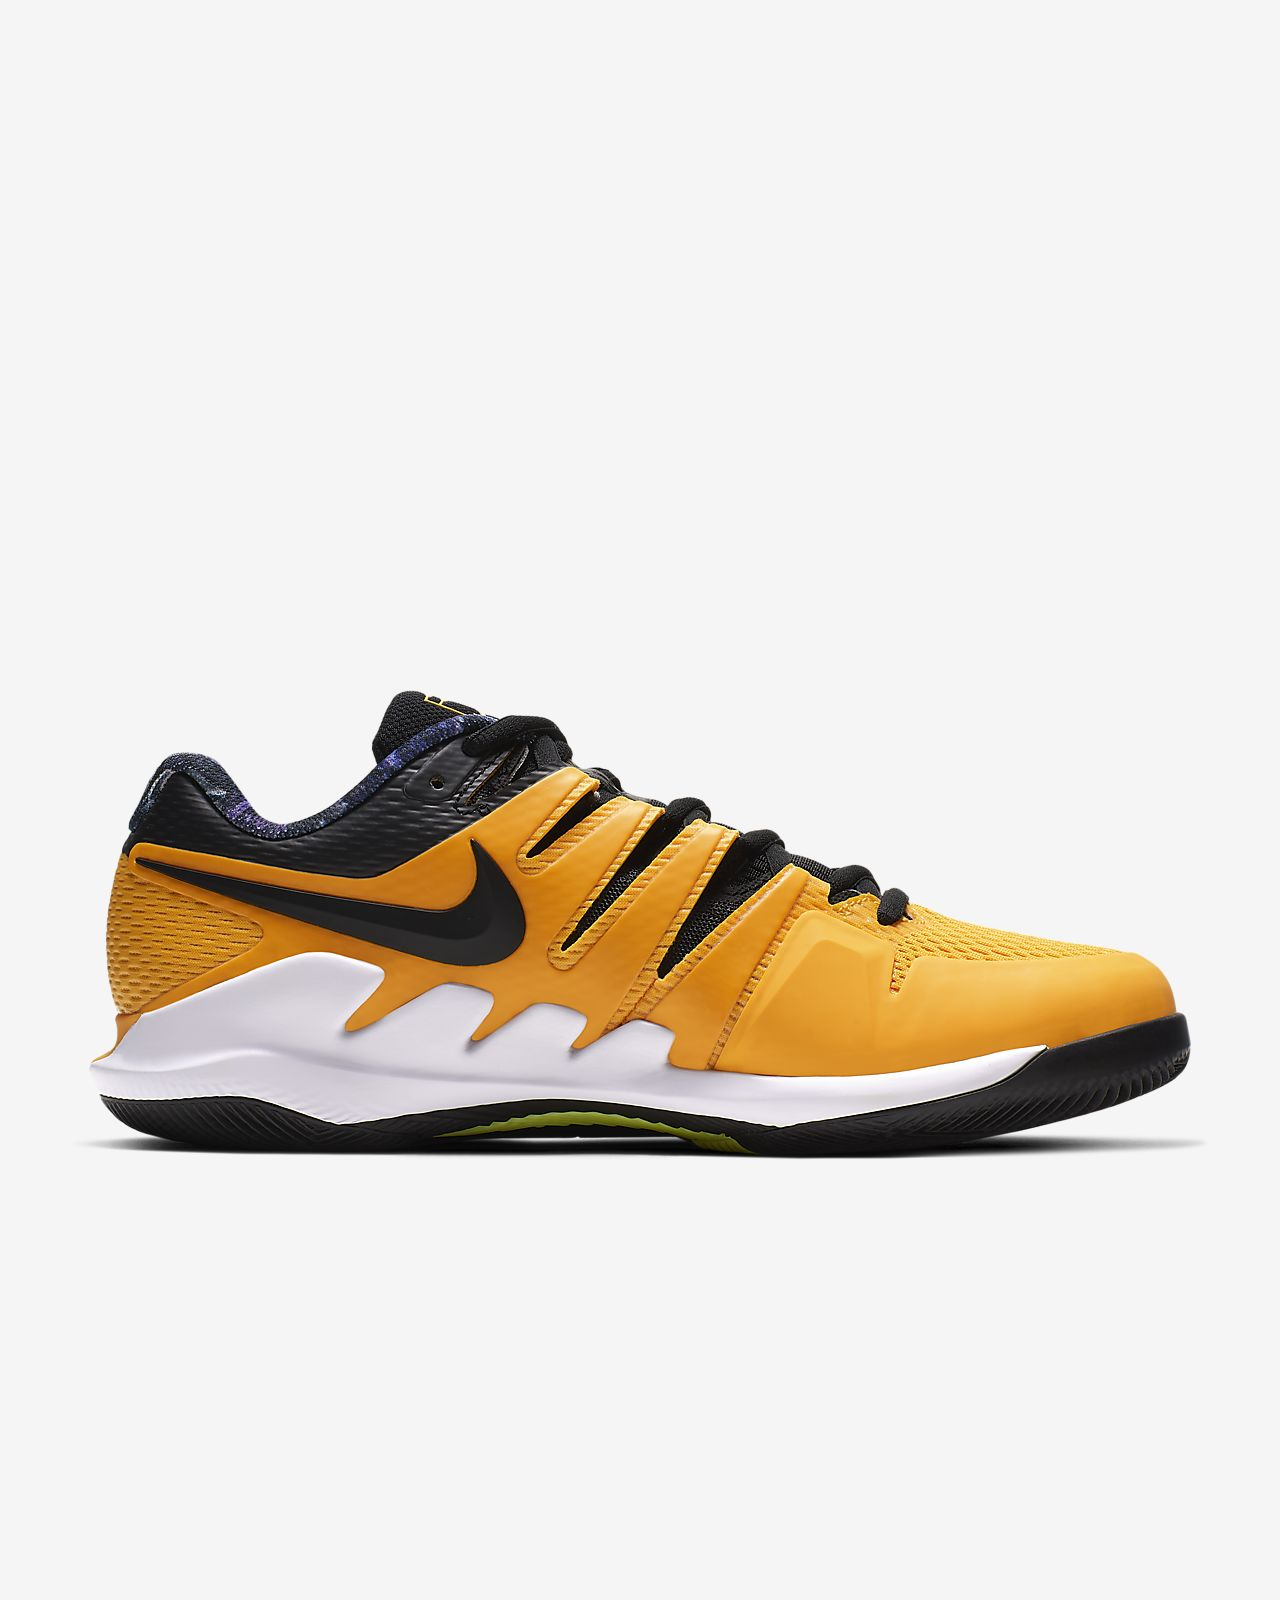 super popular 34e12 f0687 ... NikeCourt Air Zoom Vapor X Men s Hard Court Tennis Shoe